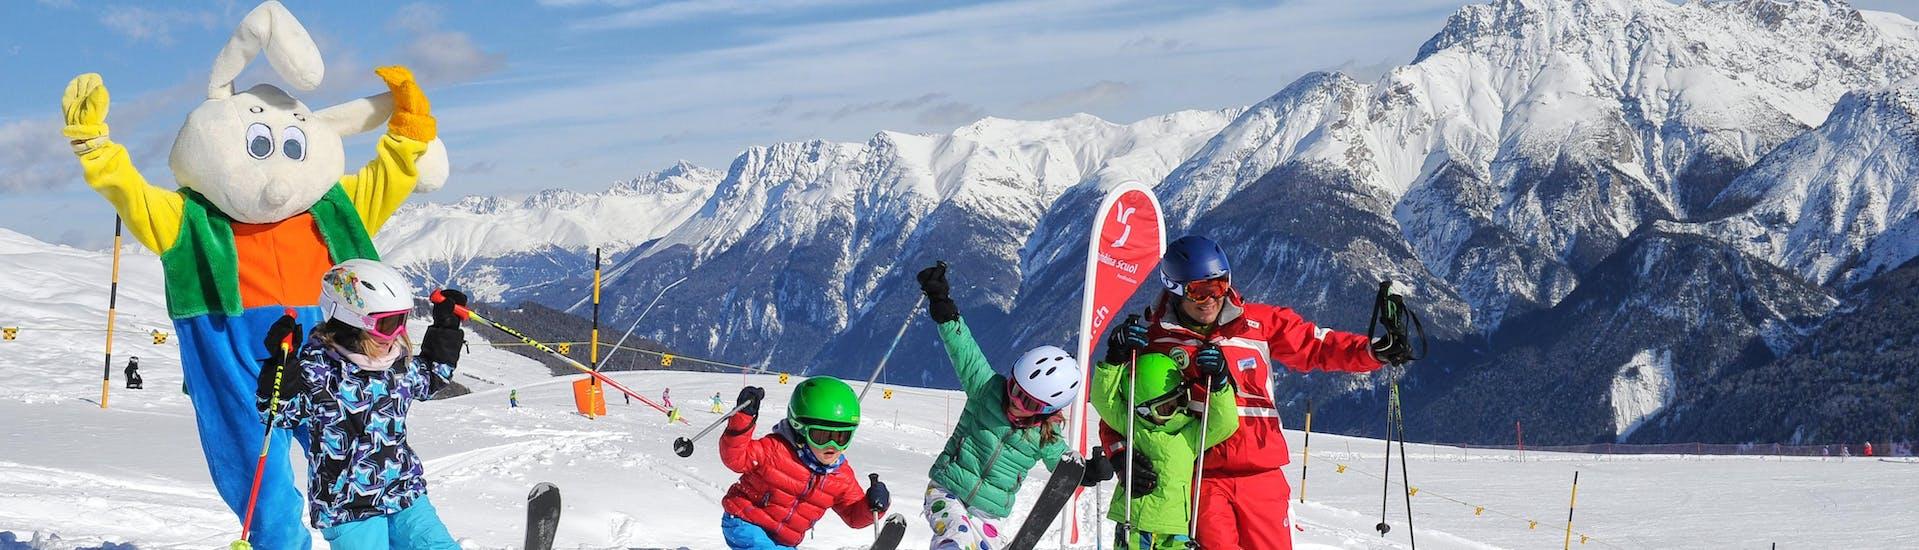 Kids Ski Lessons (3-16 y.) for Advanced Skiers - Half Day